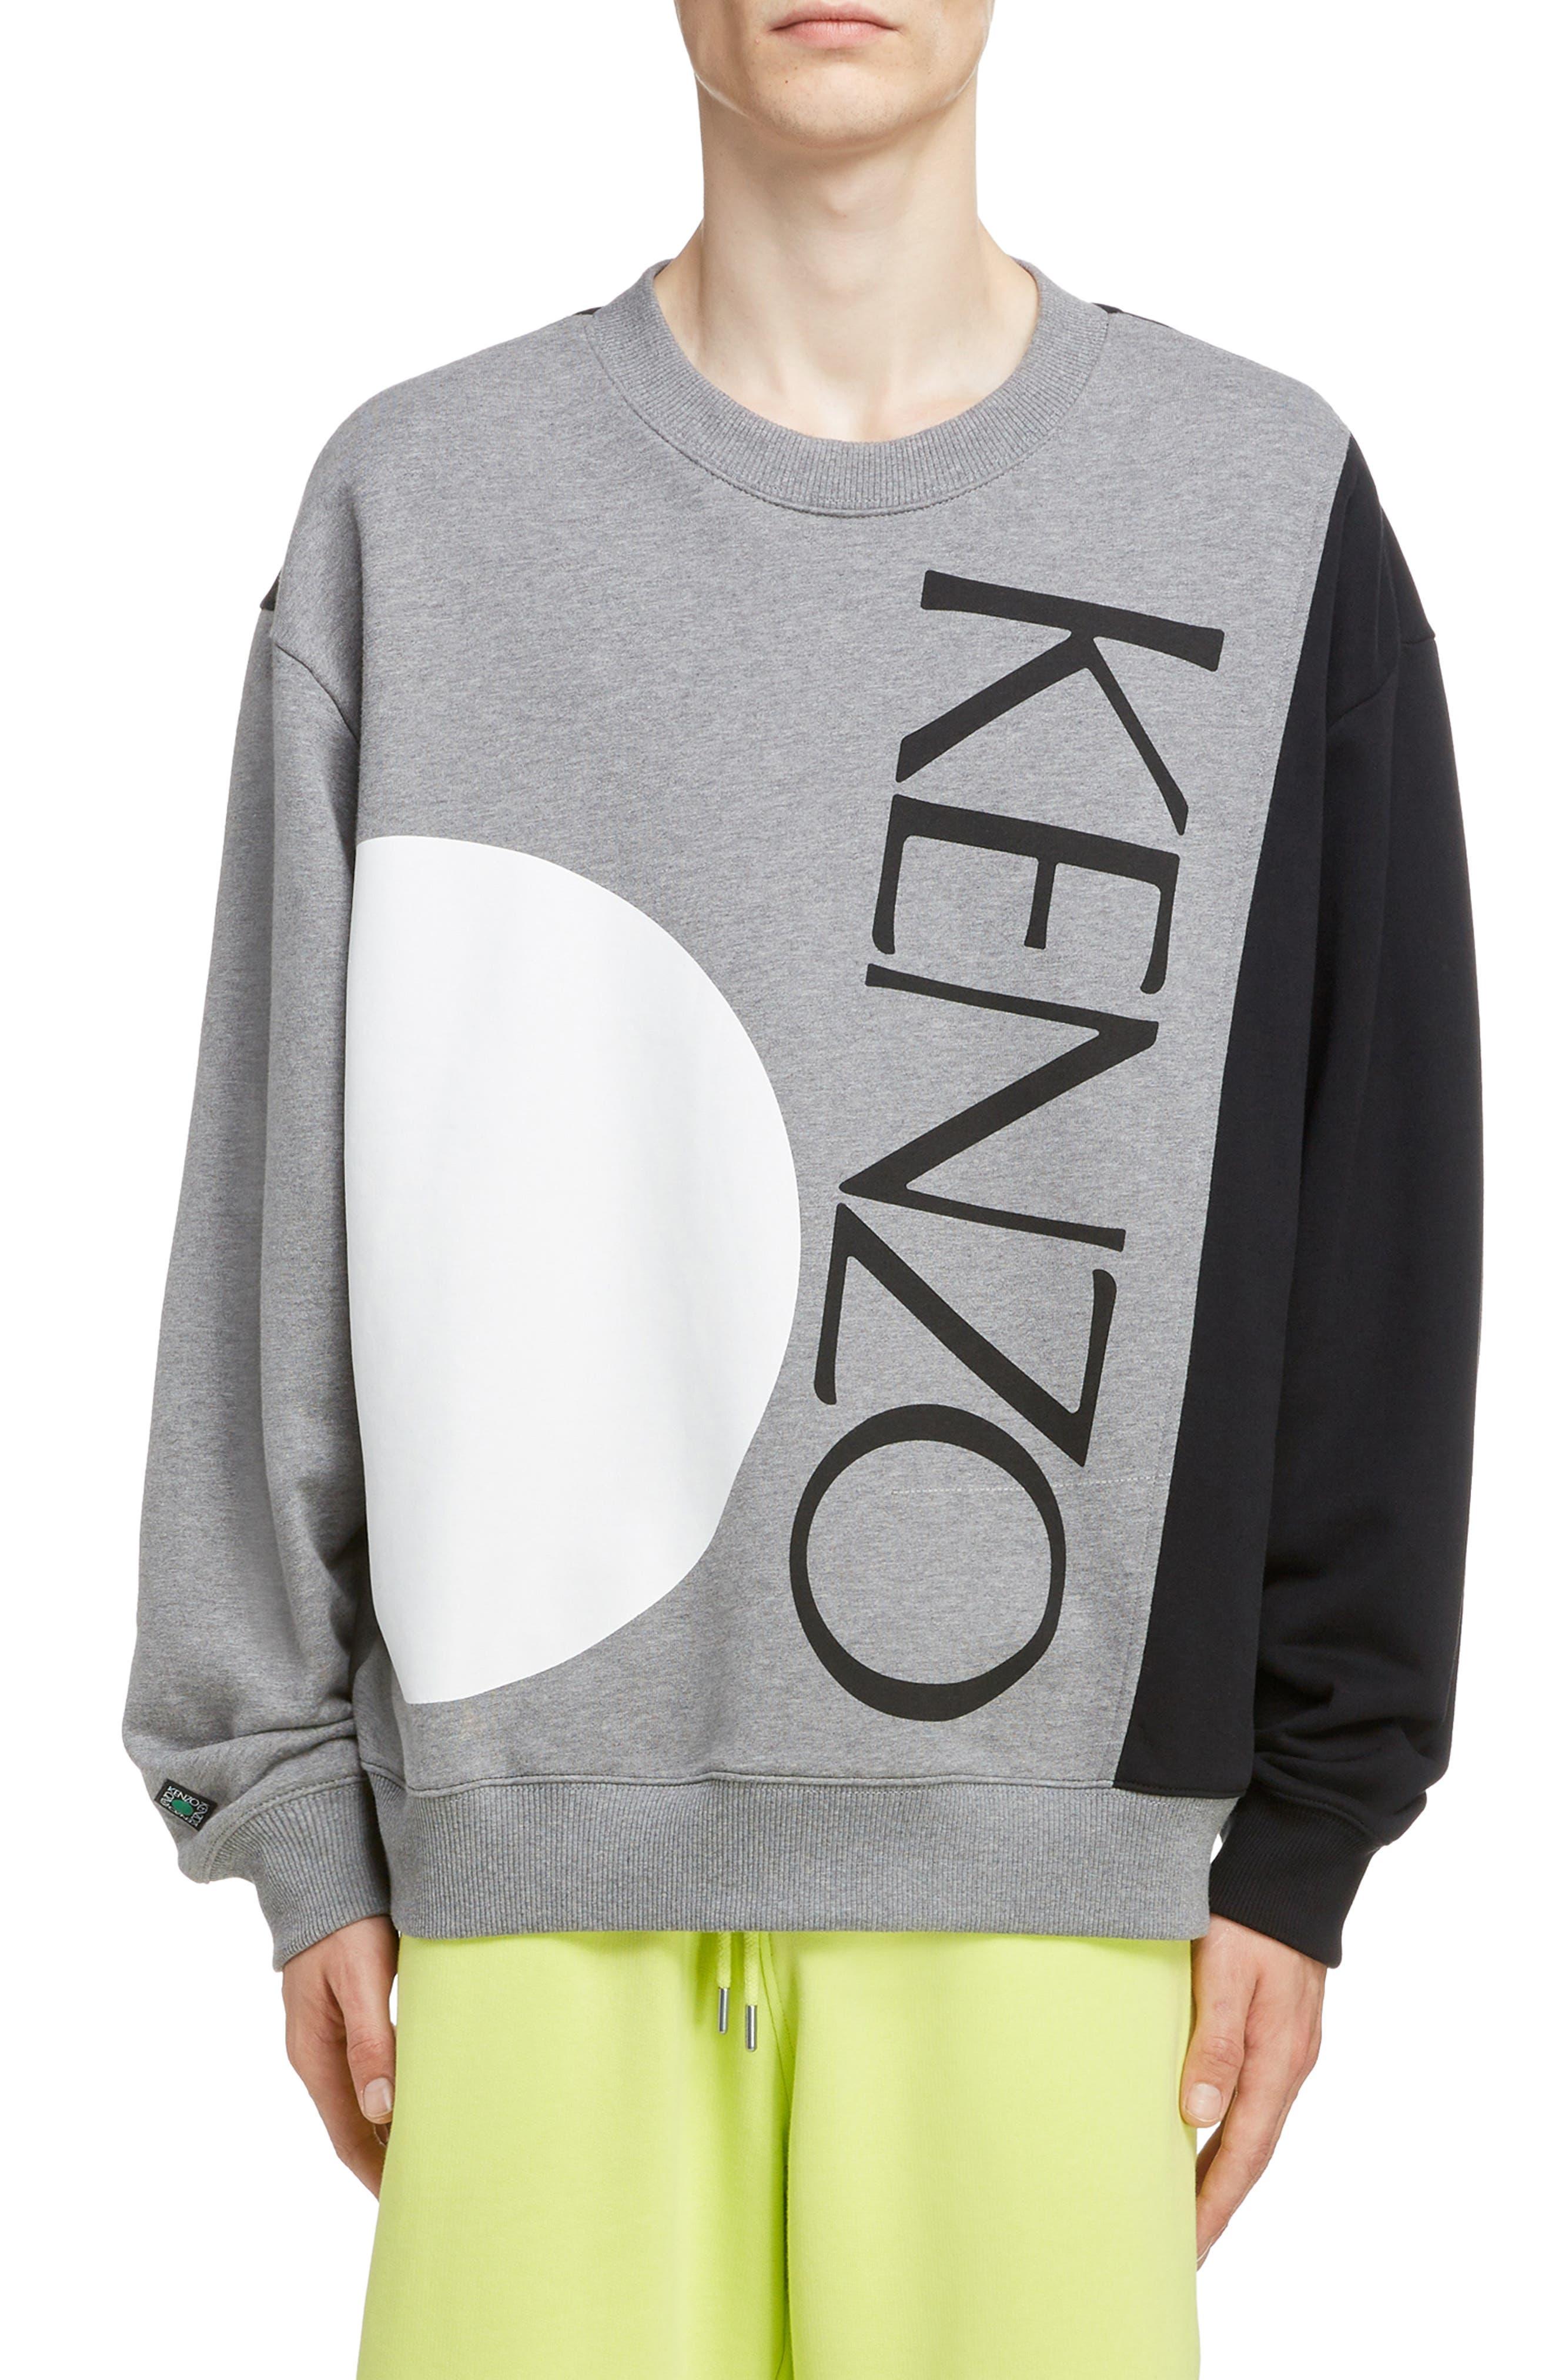 KENZO Oversize Colorblock Sweatshirt, Main, color, DOVE GREY